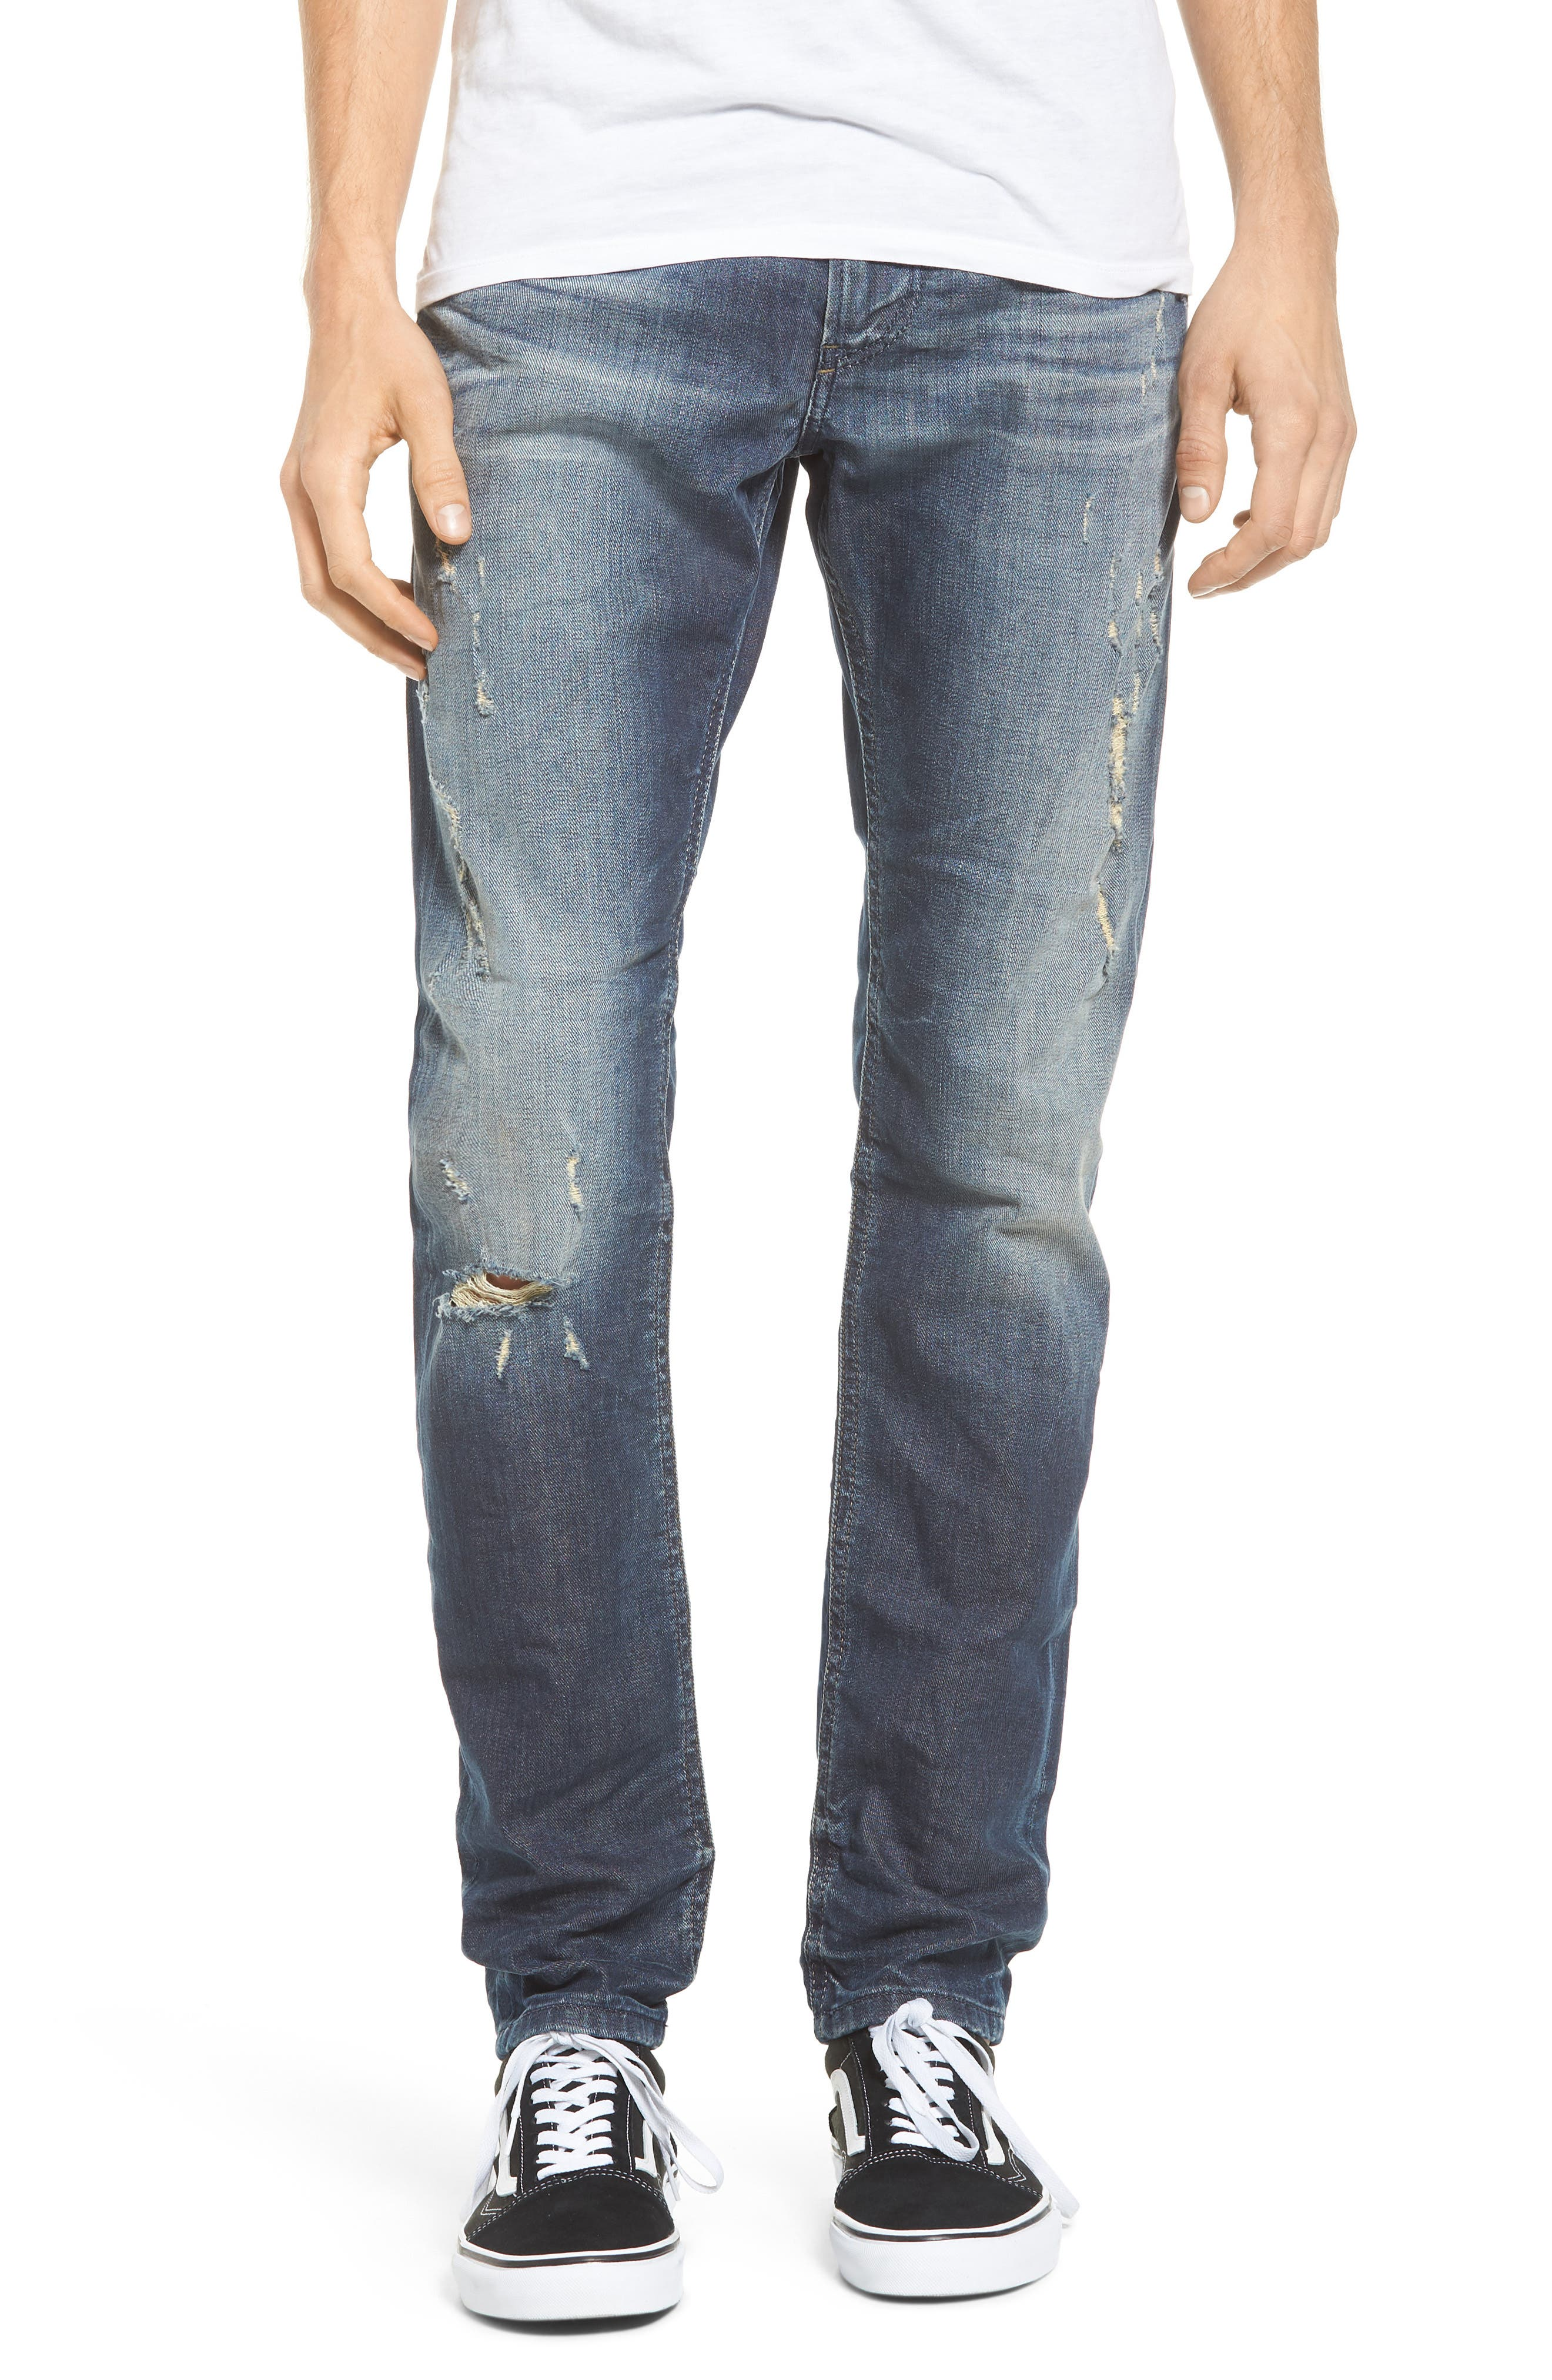 Thommer Slim Fit Jeans,                             Main thumbnail 1, color,                             Denim